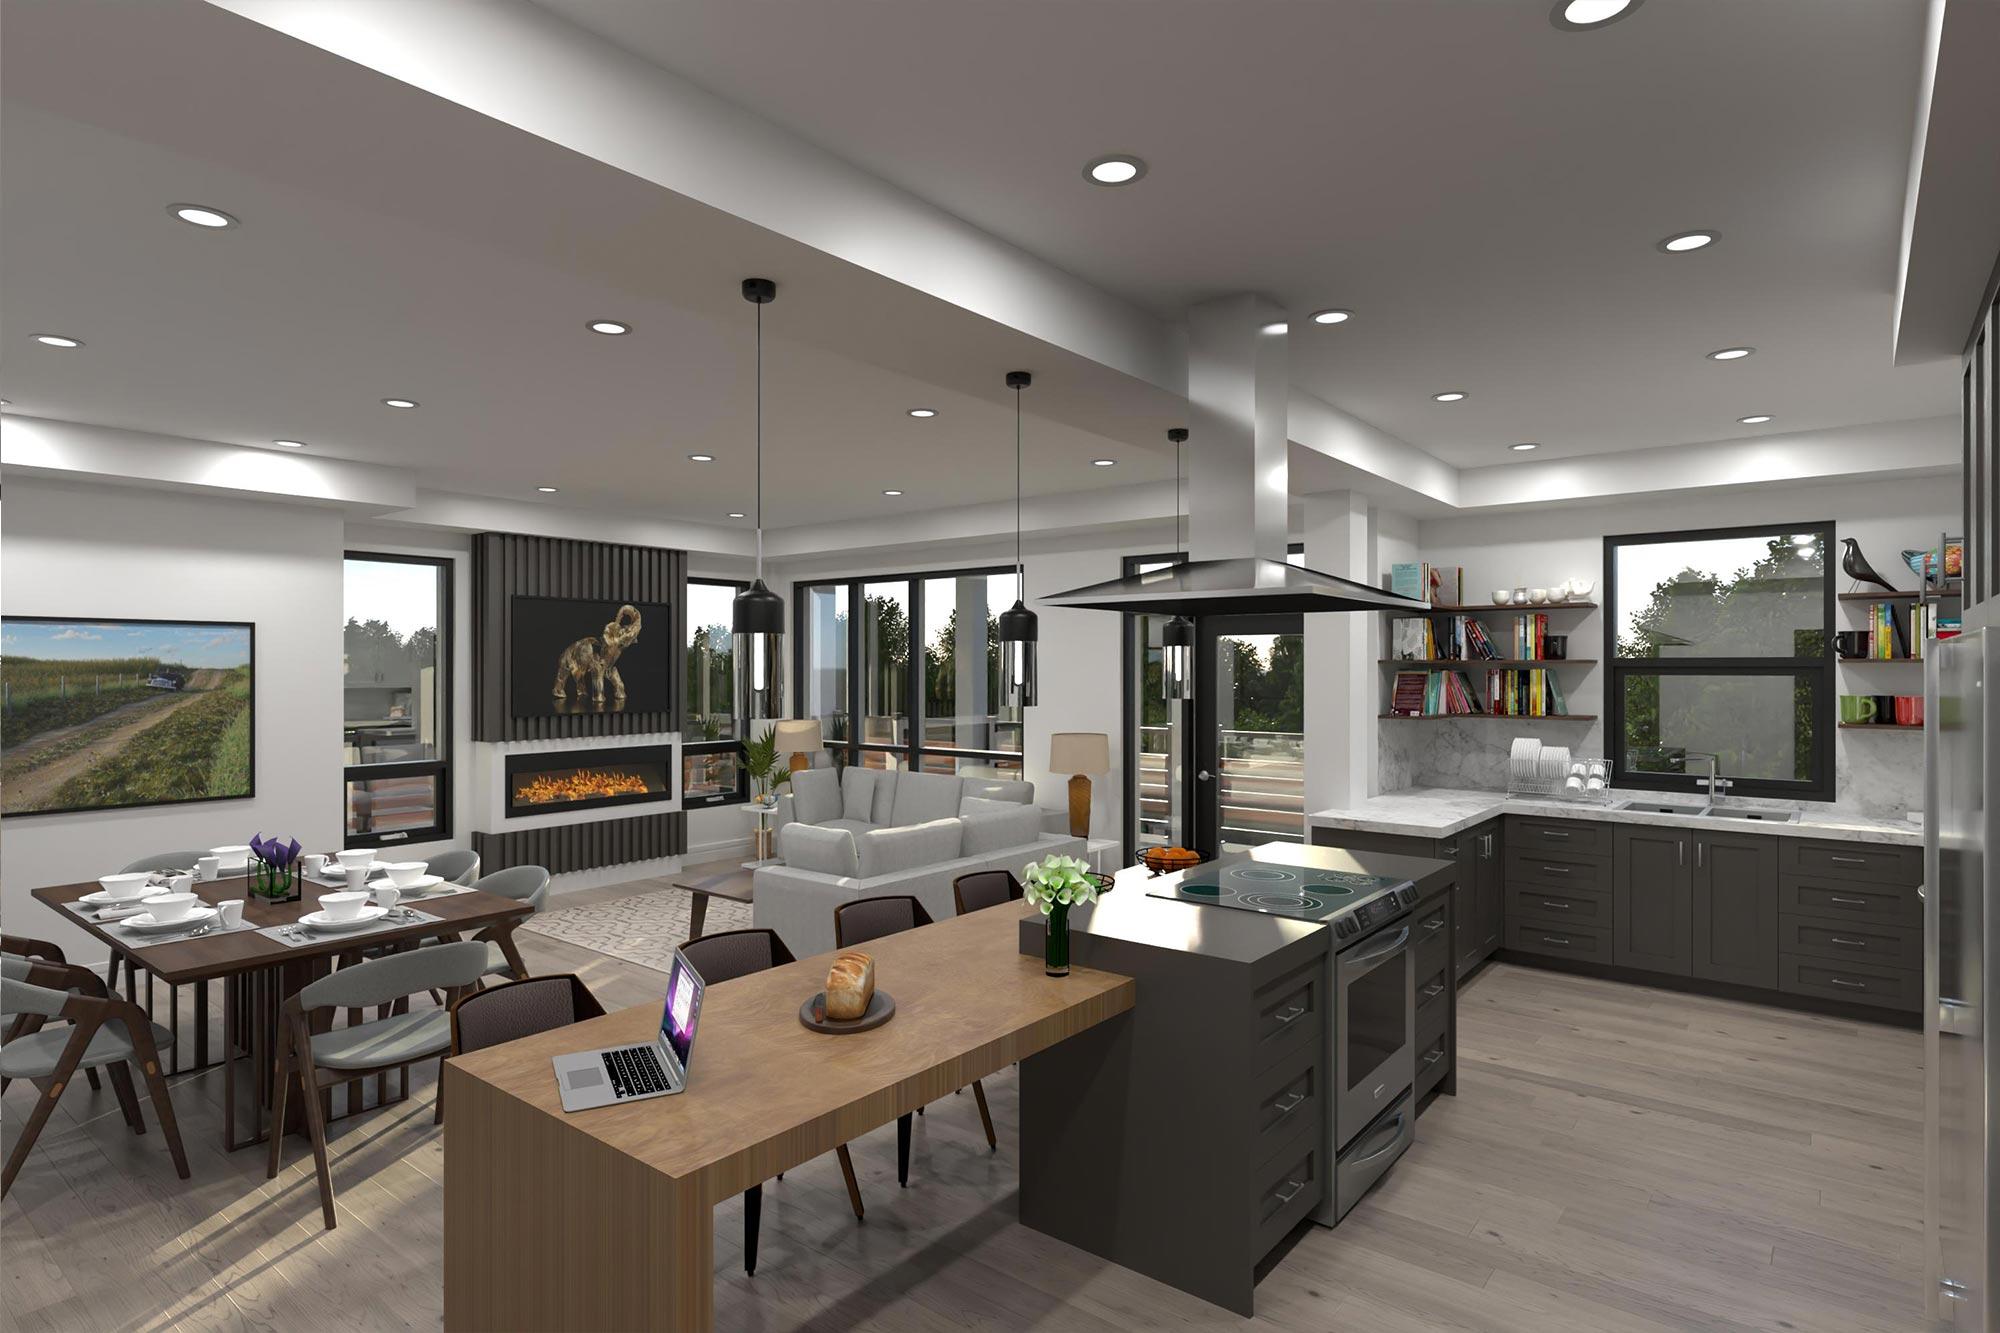 Interior - Fairford Apartments - 160 Fairford St E - Moose Jaw